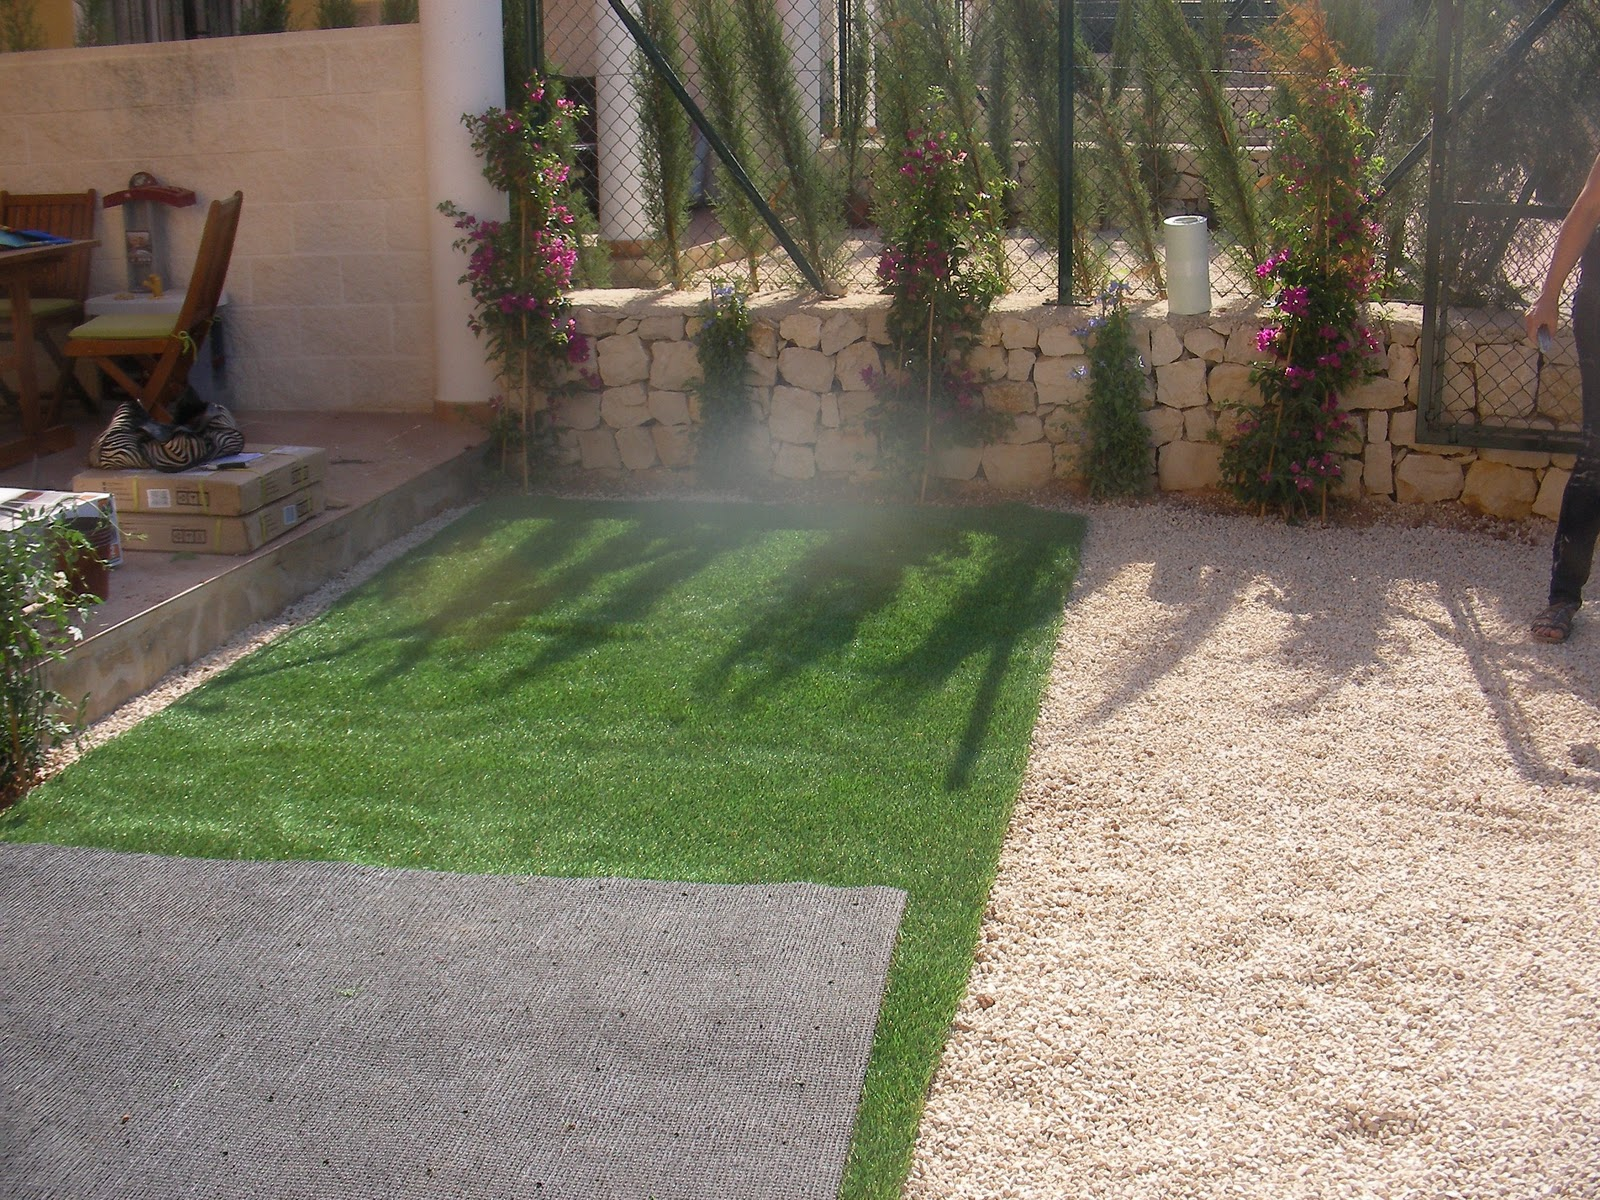 Ideagarden jardin con cesped artificial en calpesol for Jardines cesped artificial piedras